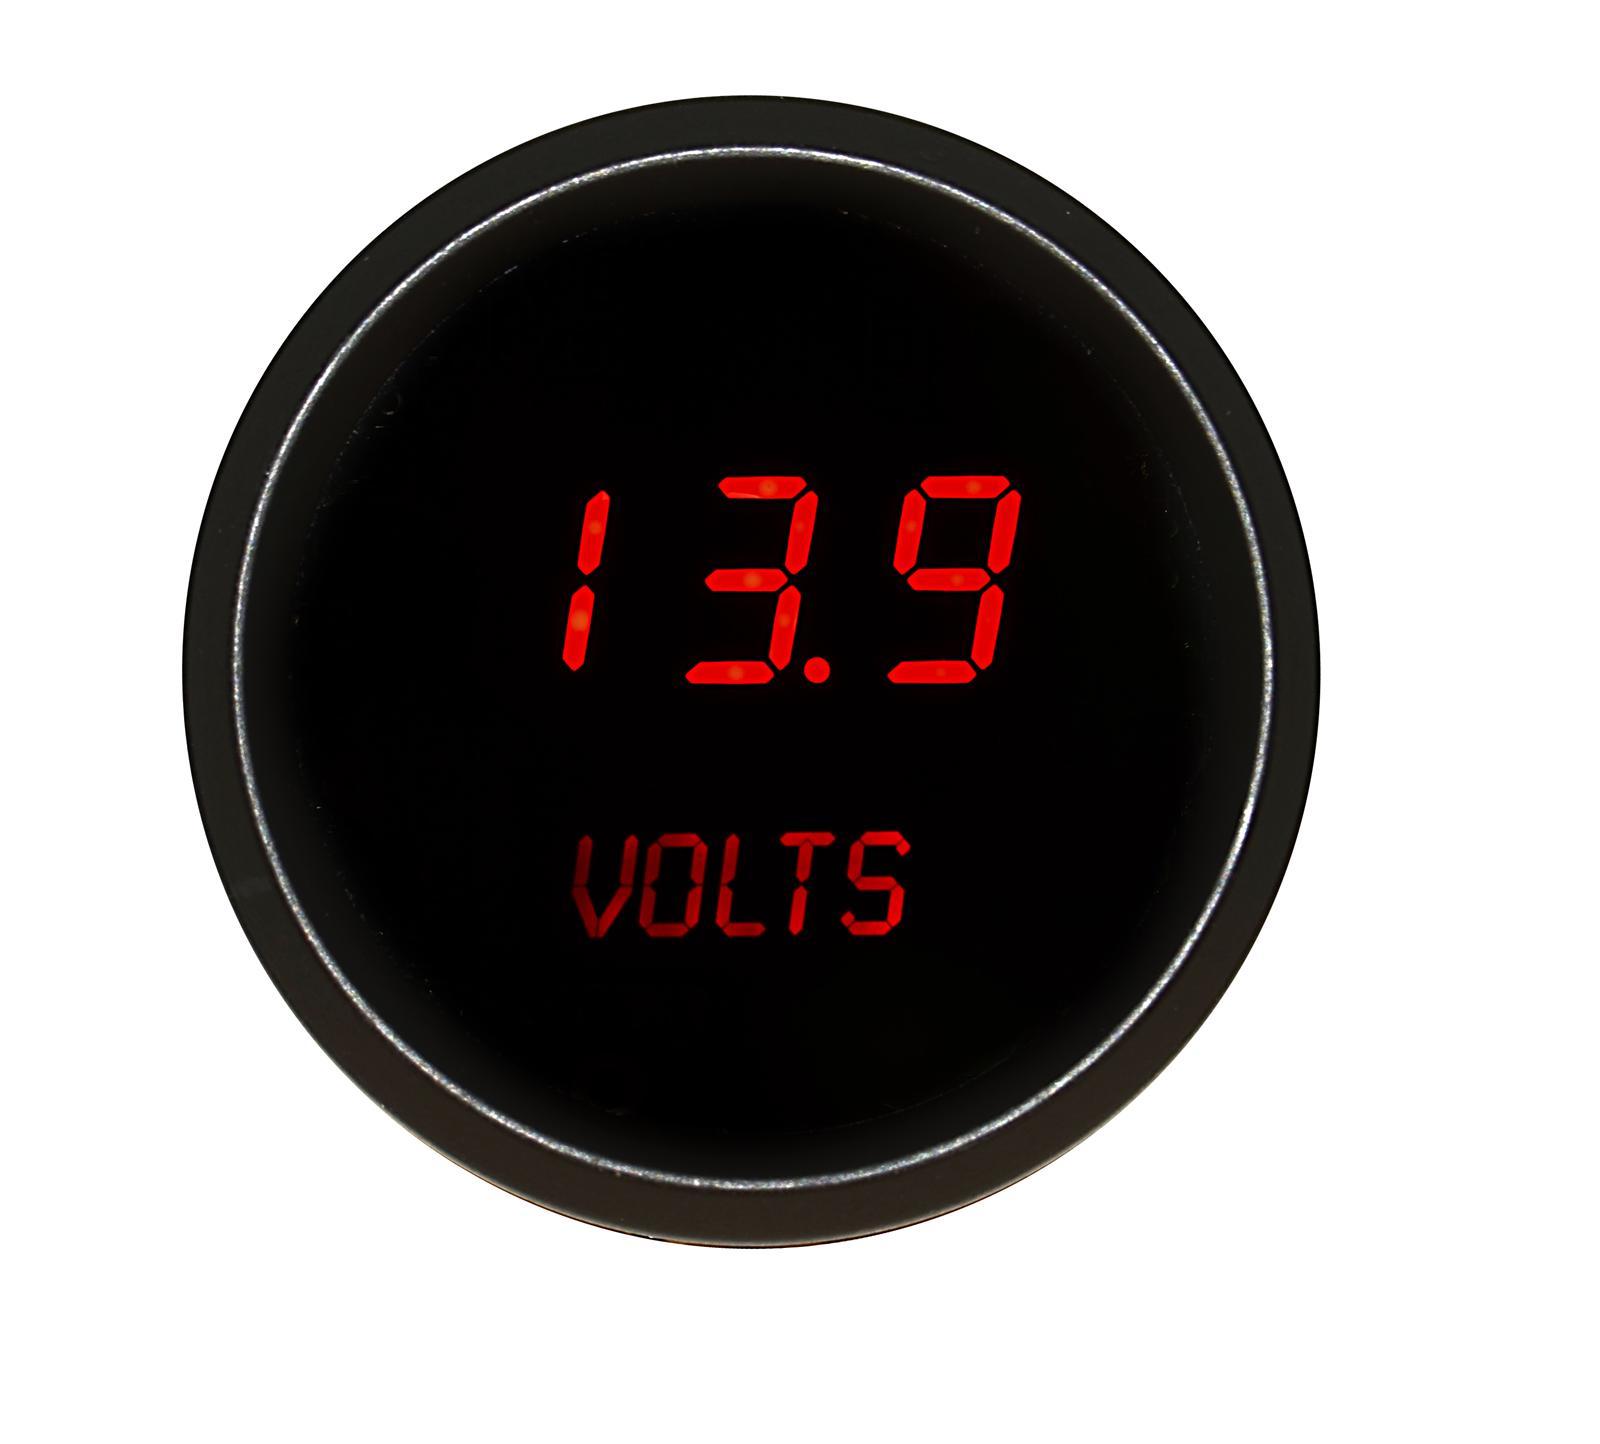 Intellitronix Digital Gauges : Intellitronix led digital gauges m r free shipping on